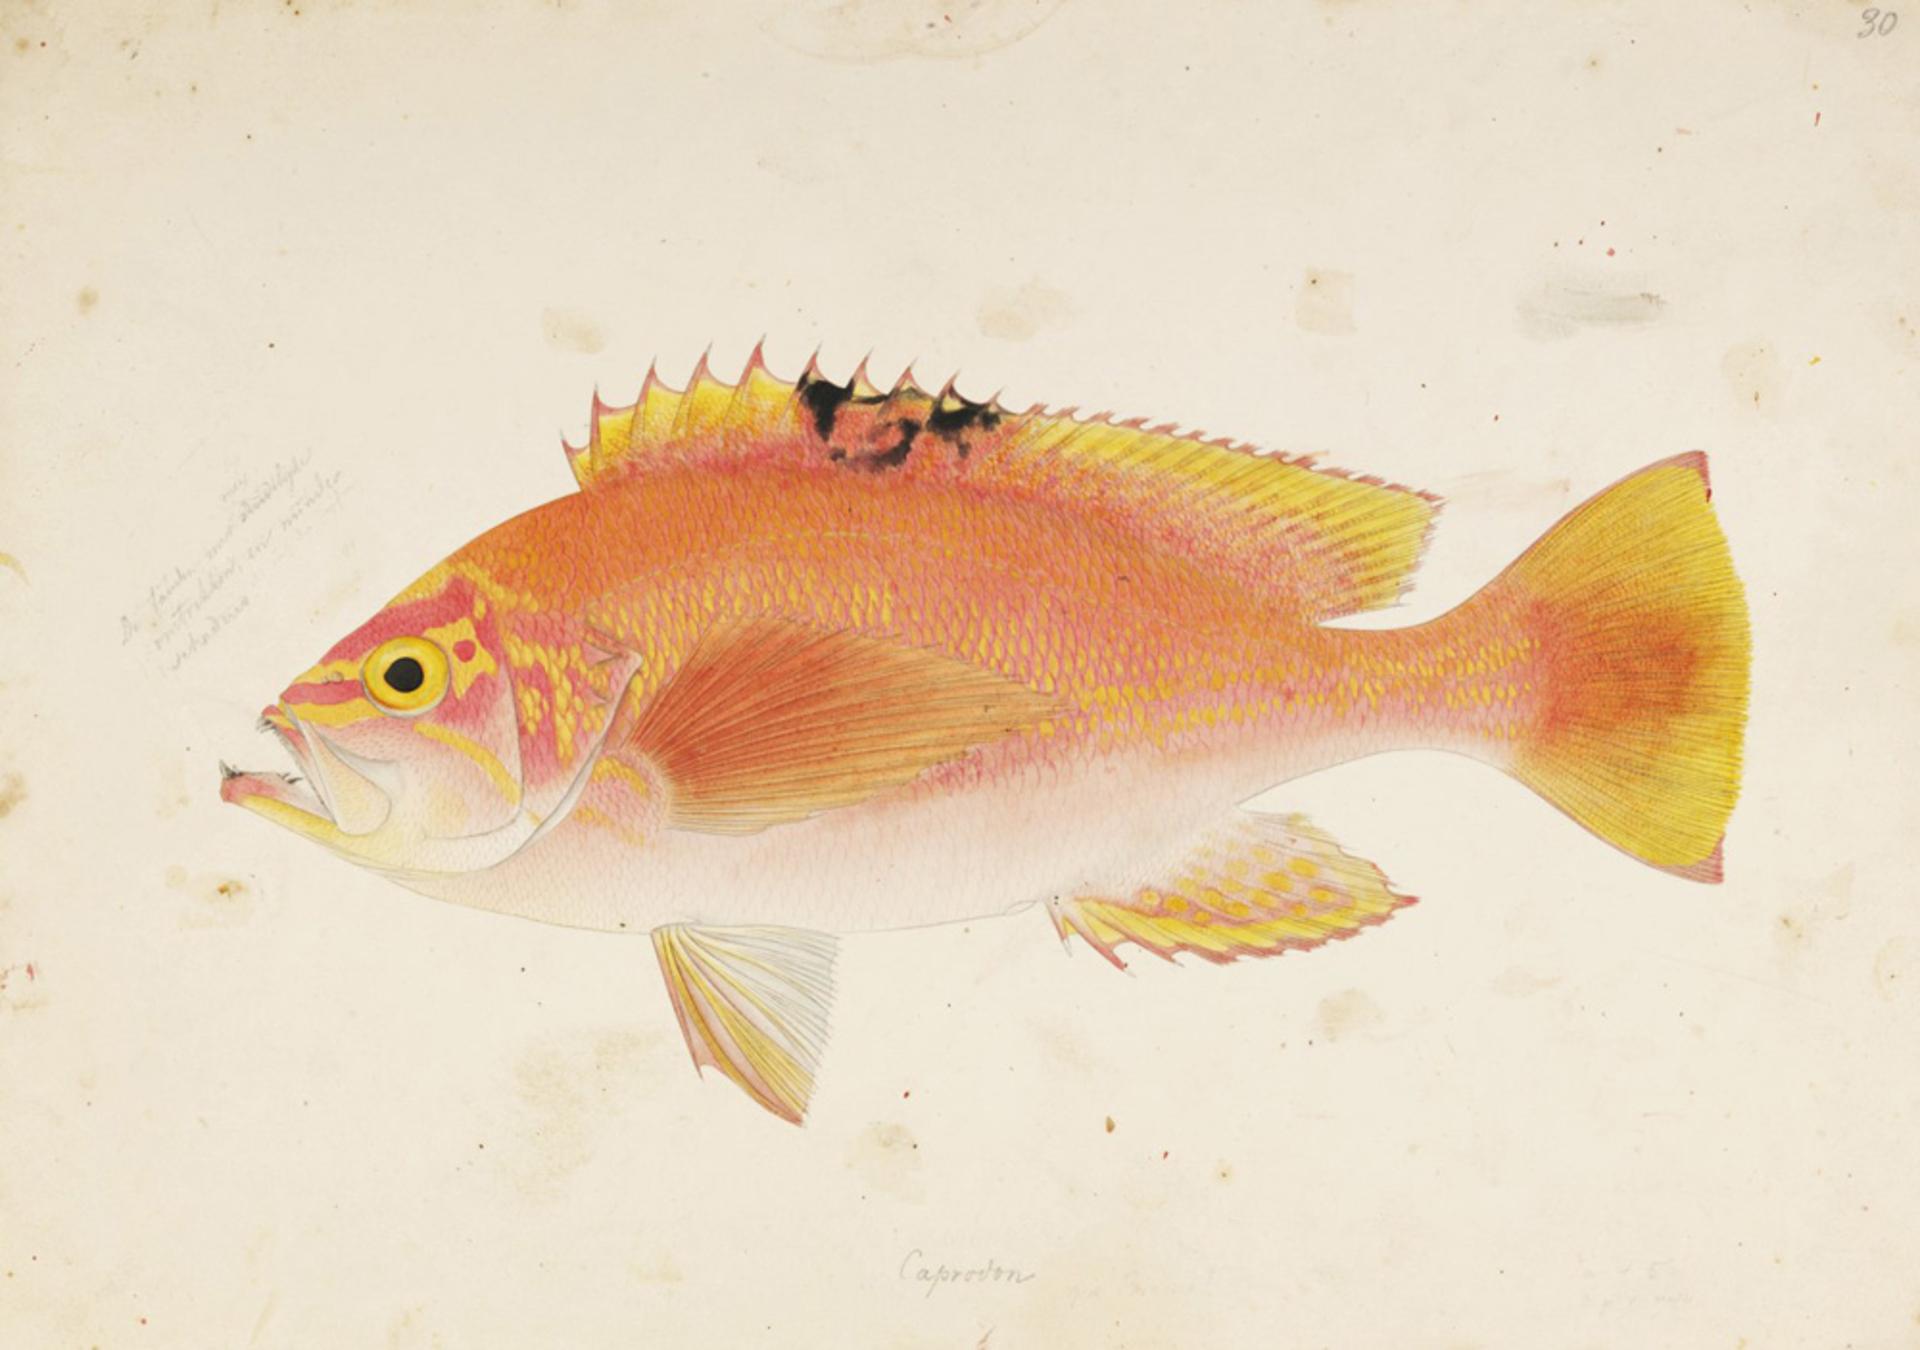 RMNH.ART.377 | Caprodon schlegeli